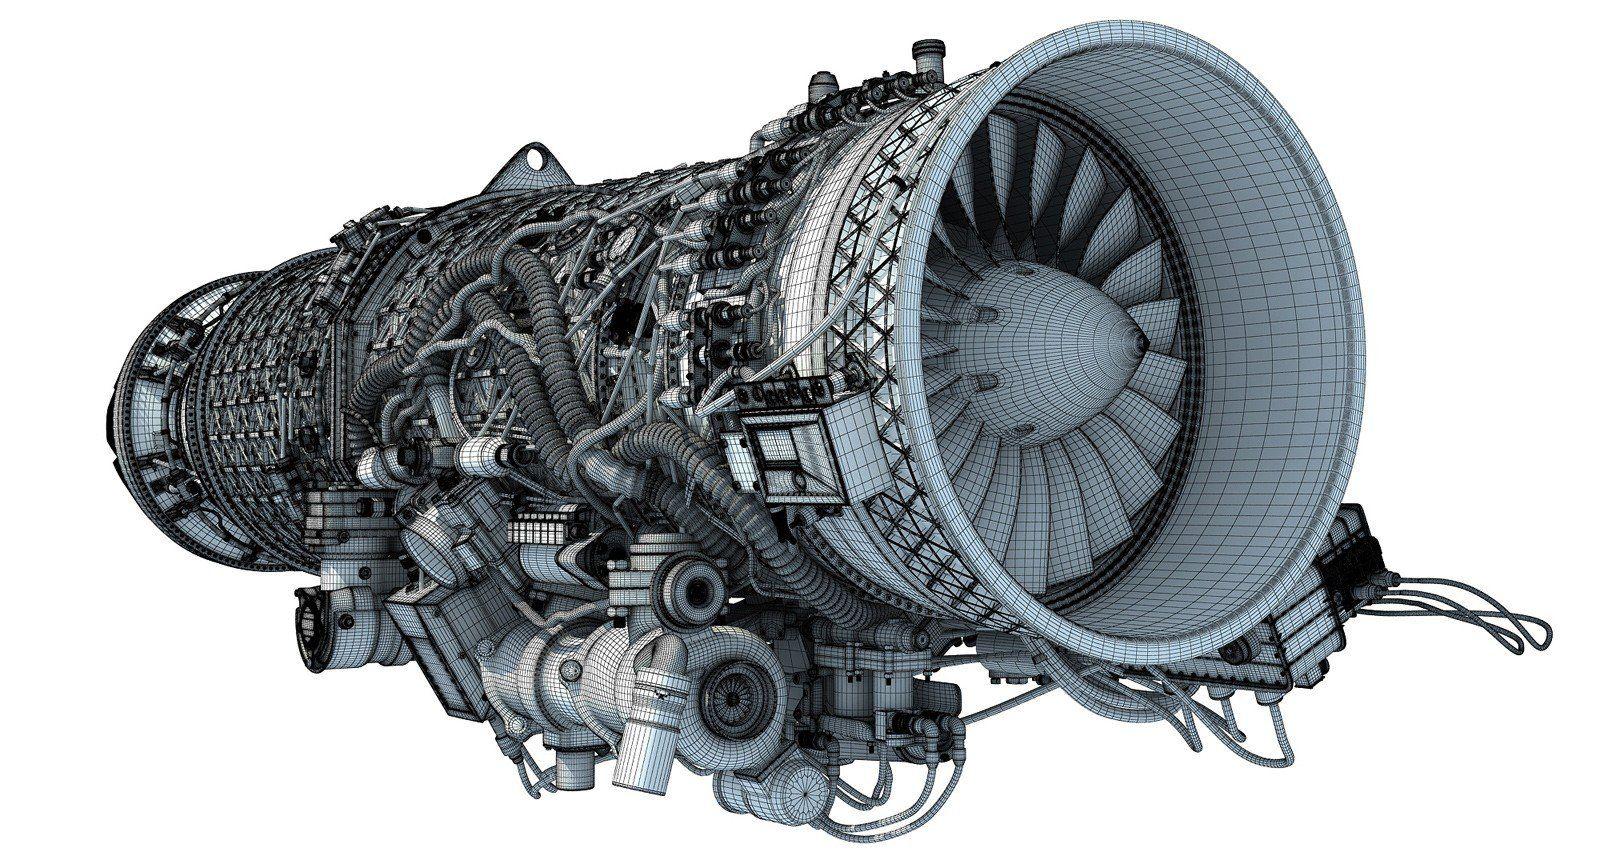 Eurojet EJ200 Turbofan Jet Engine 3D Model Jet engine